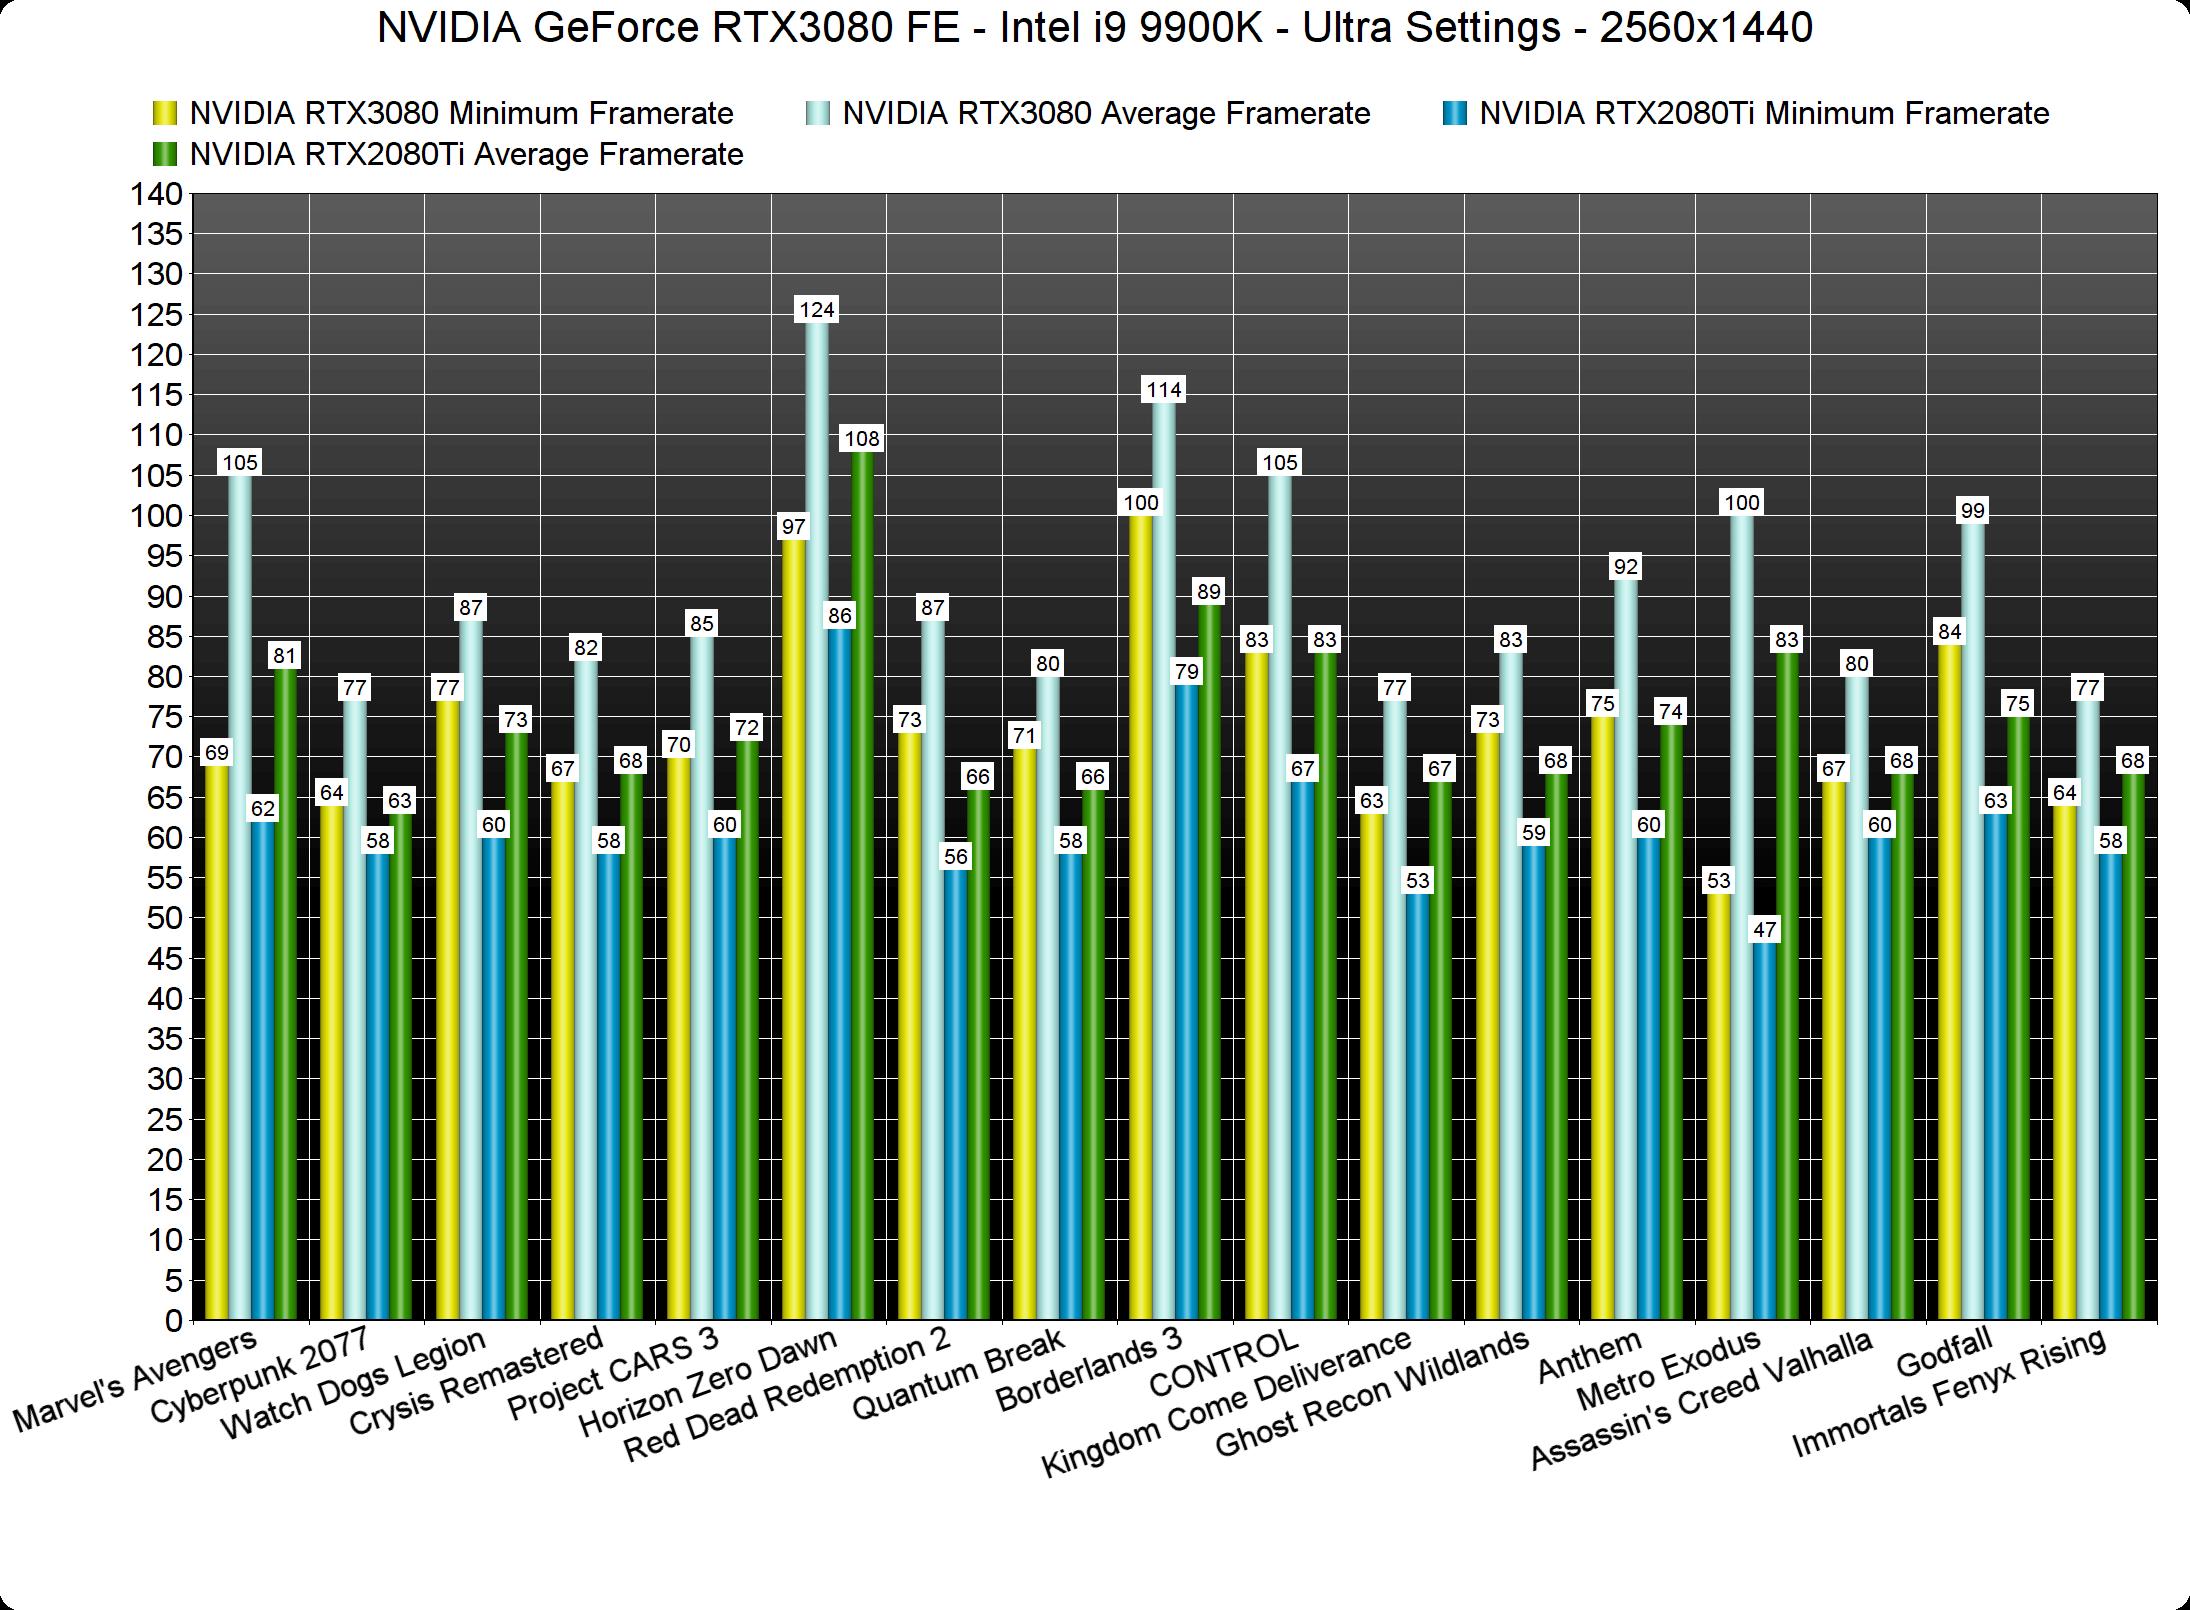 NVIDIA GeForce RTX3080 vs RTX2080Ti 1440p benchmarks